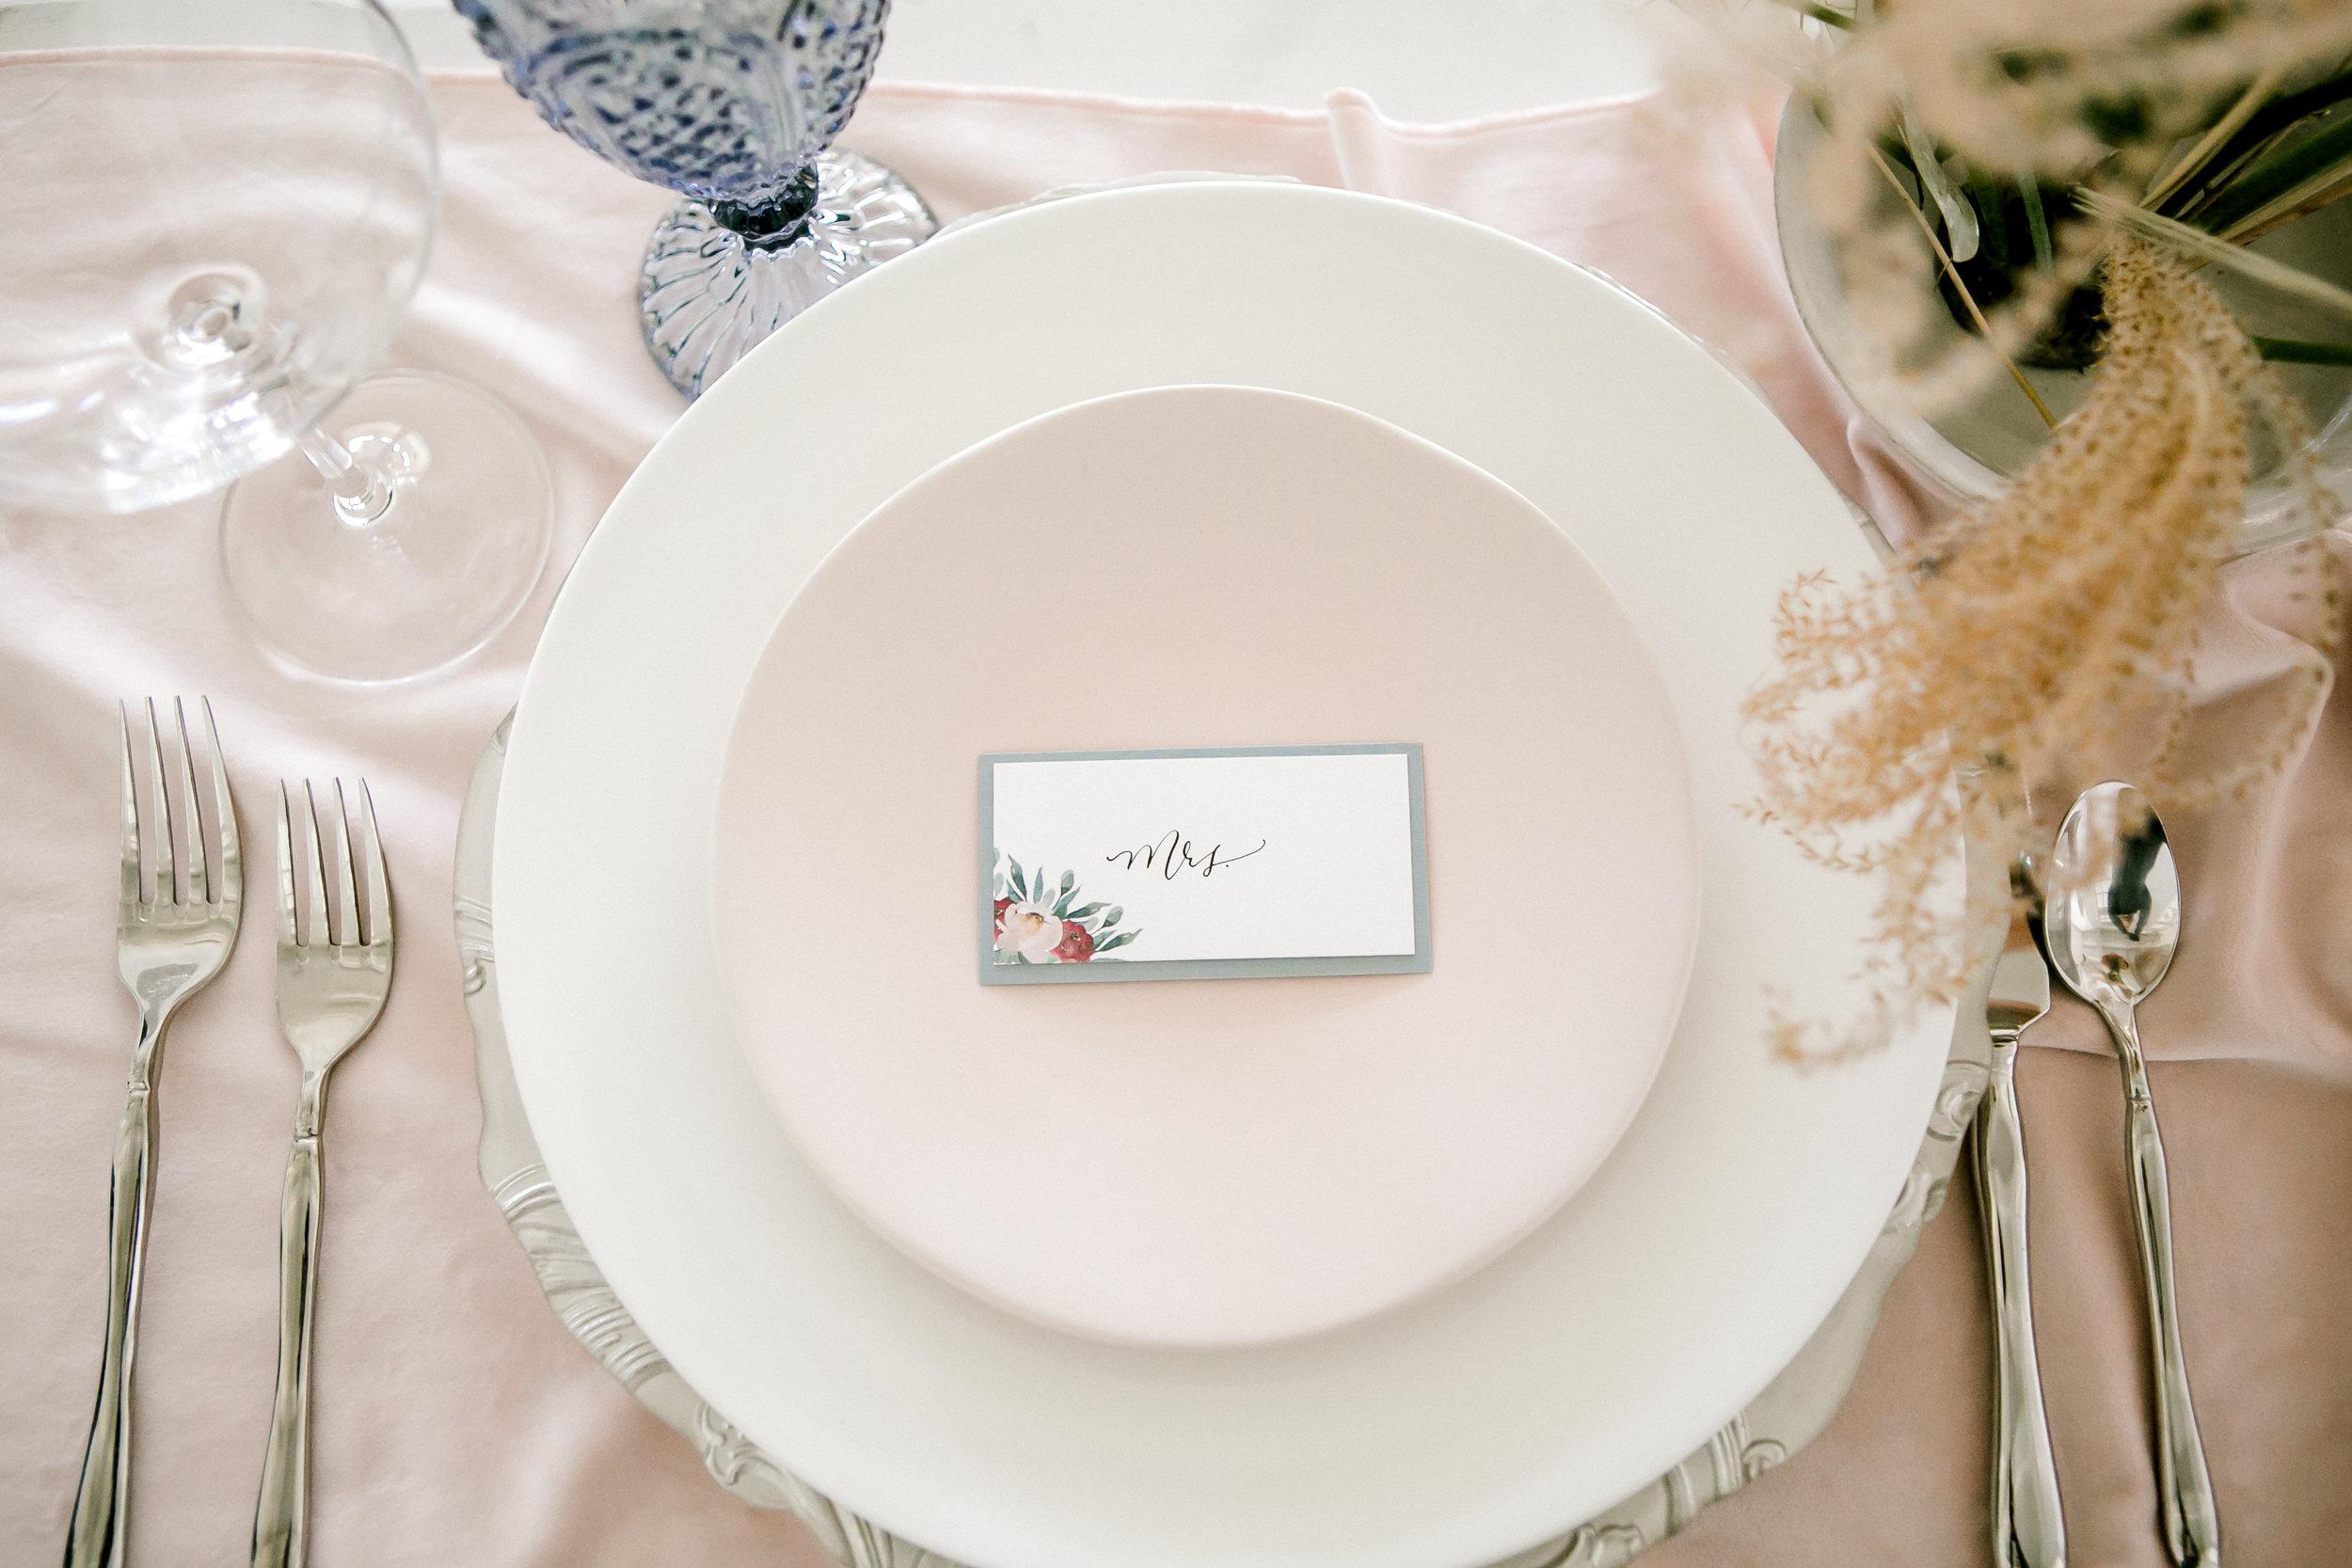 Festivities-Event-Center-Wedding-Oklahoma-City-Wedding-Photographer-Emily-Nicole-Photo-201.jpg